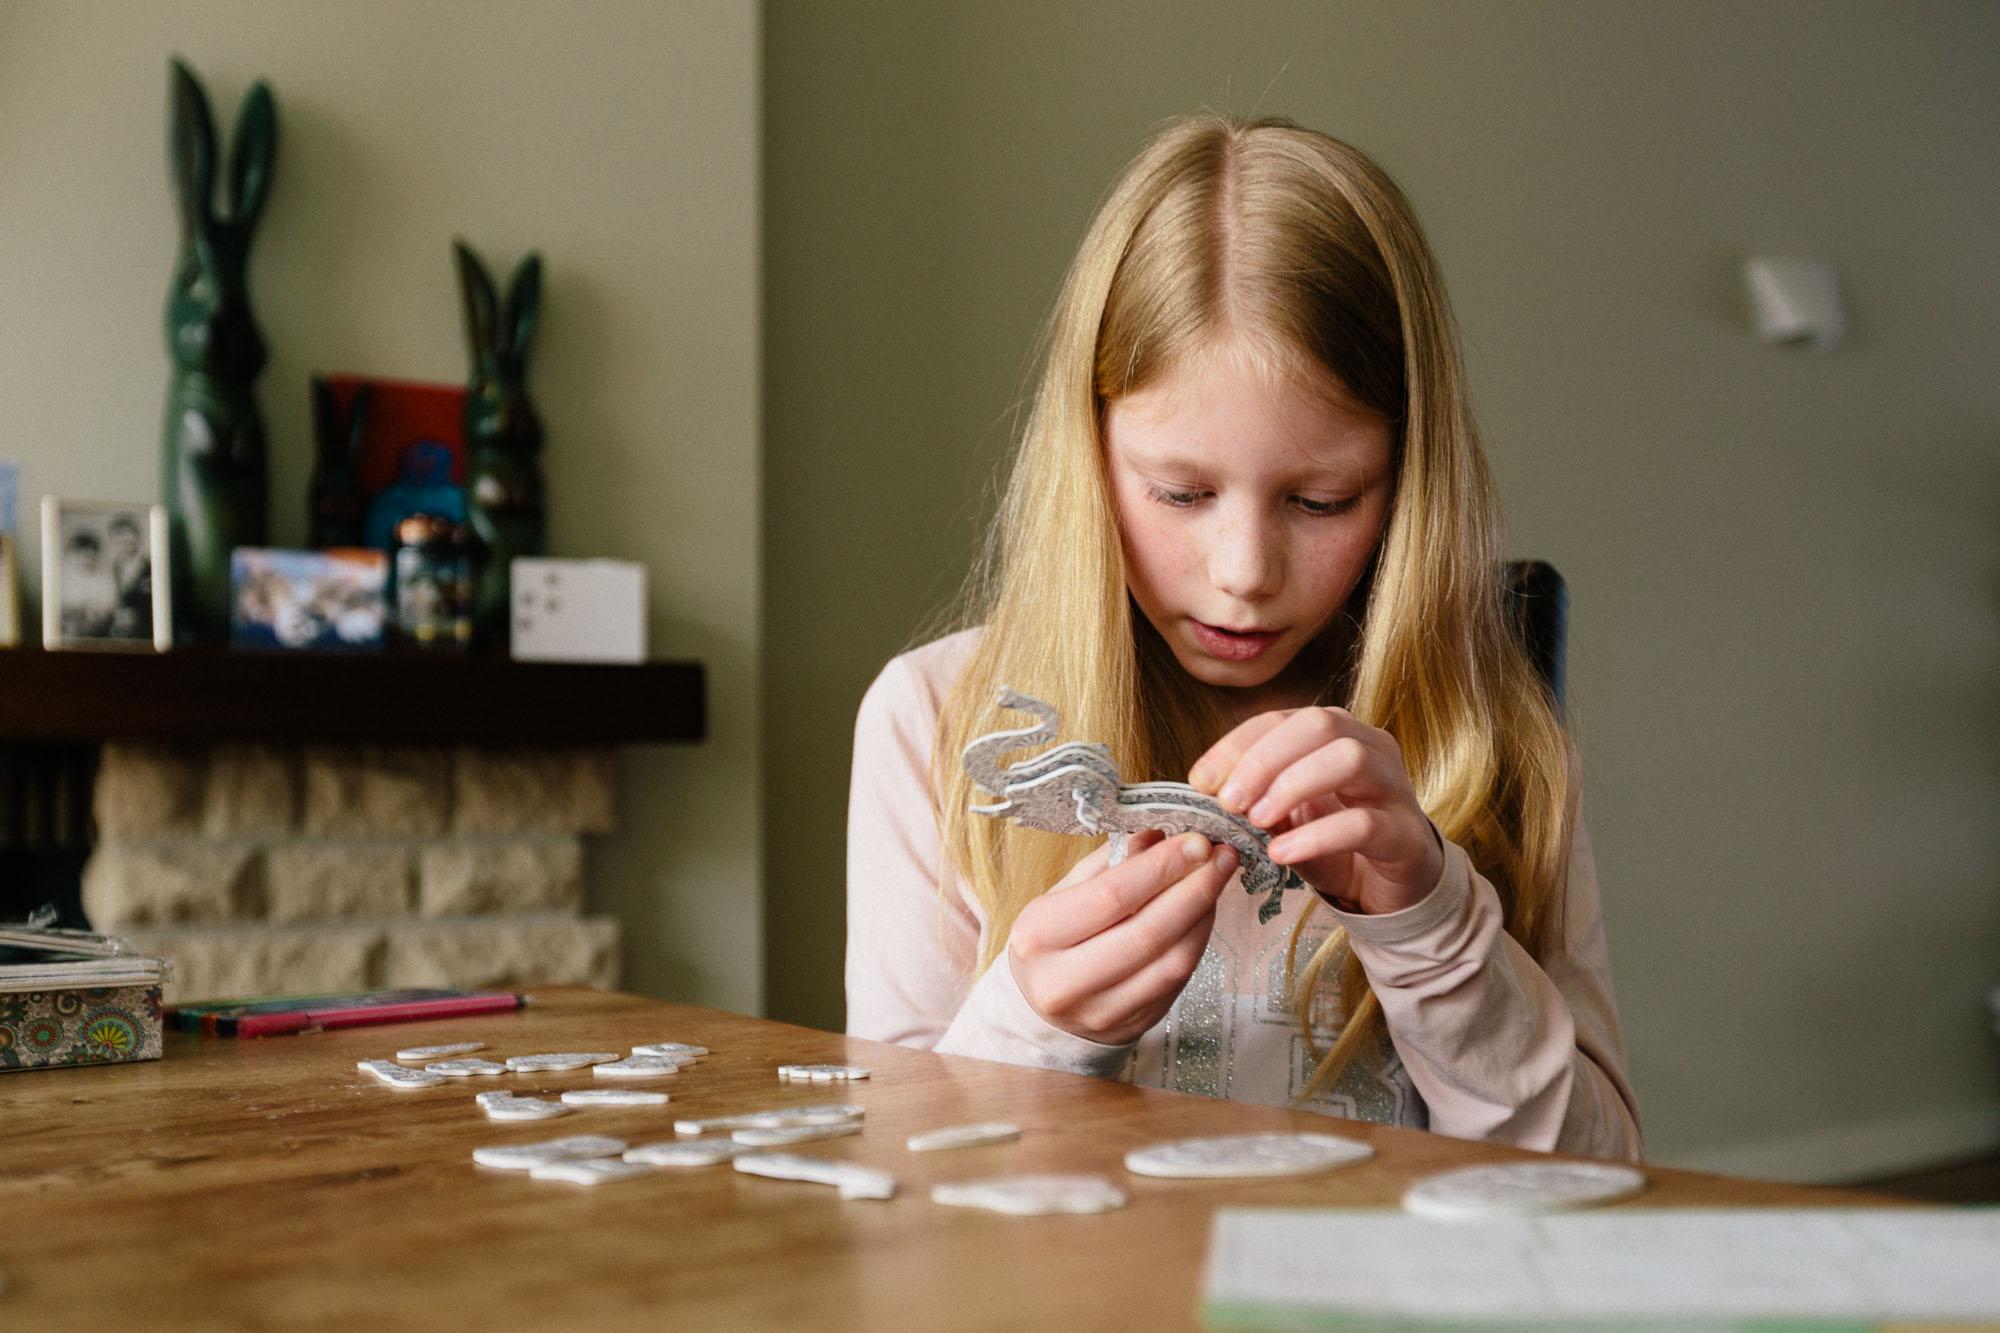 child constructing cardboard animals